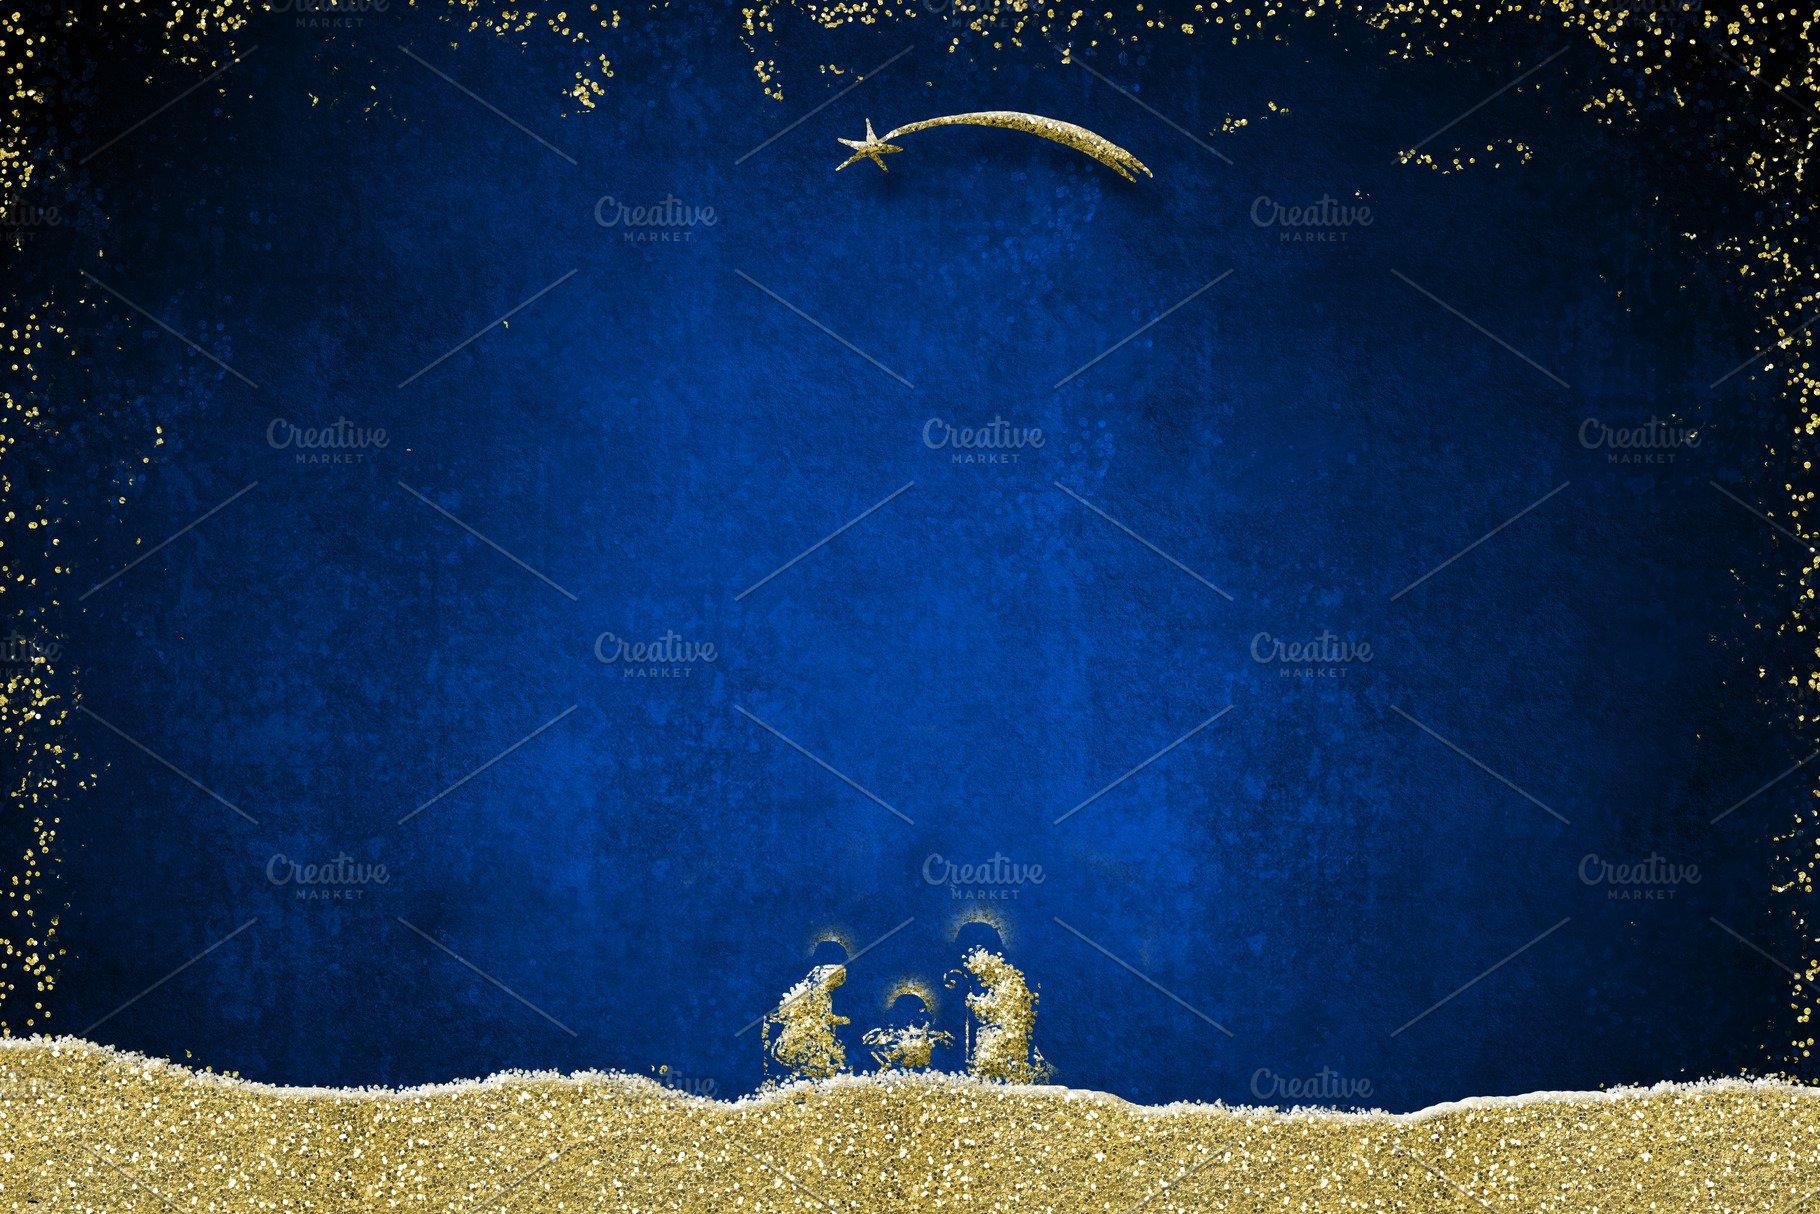 Christmas Nativity Scene Backgrounds Photos Creative Market